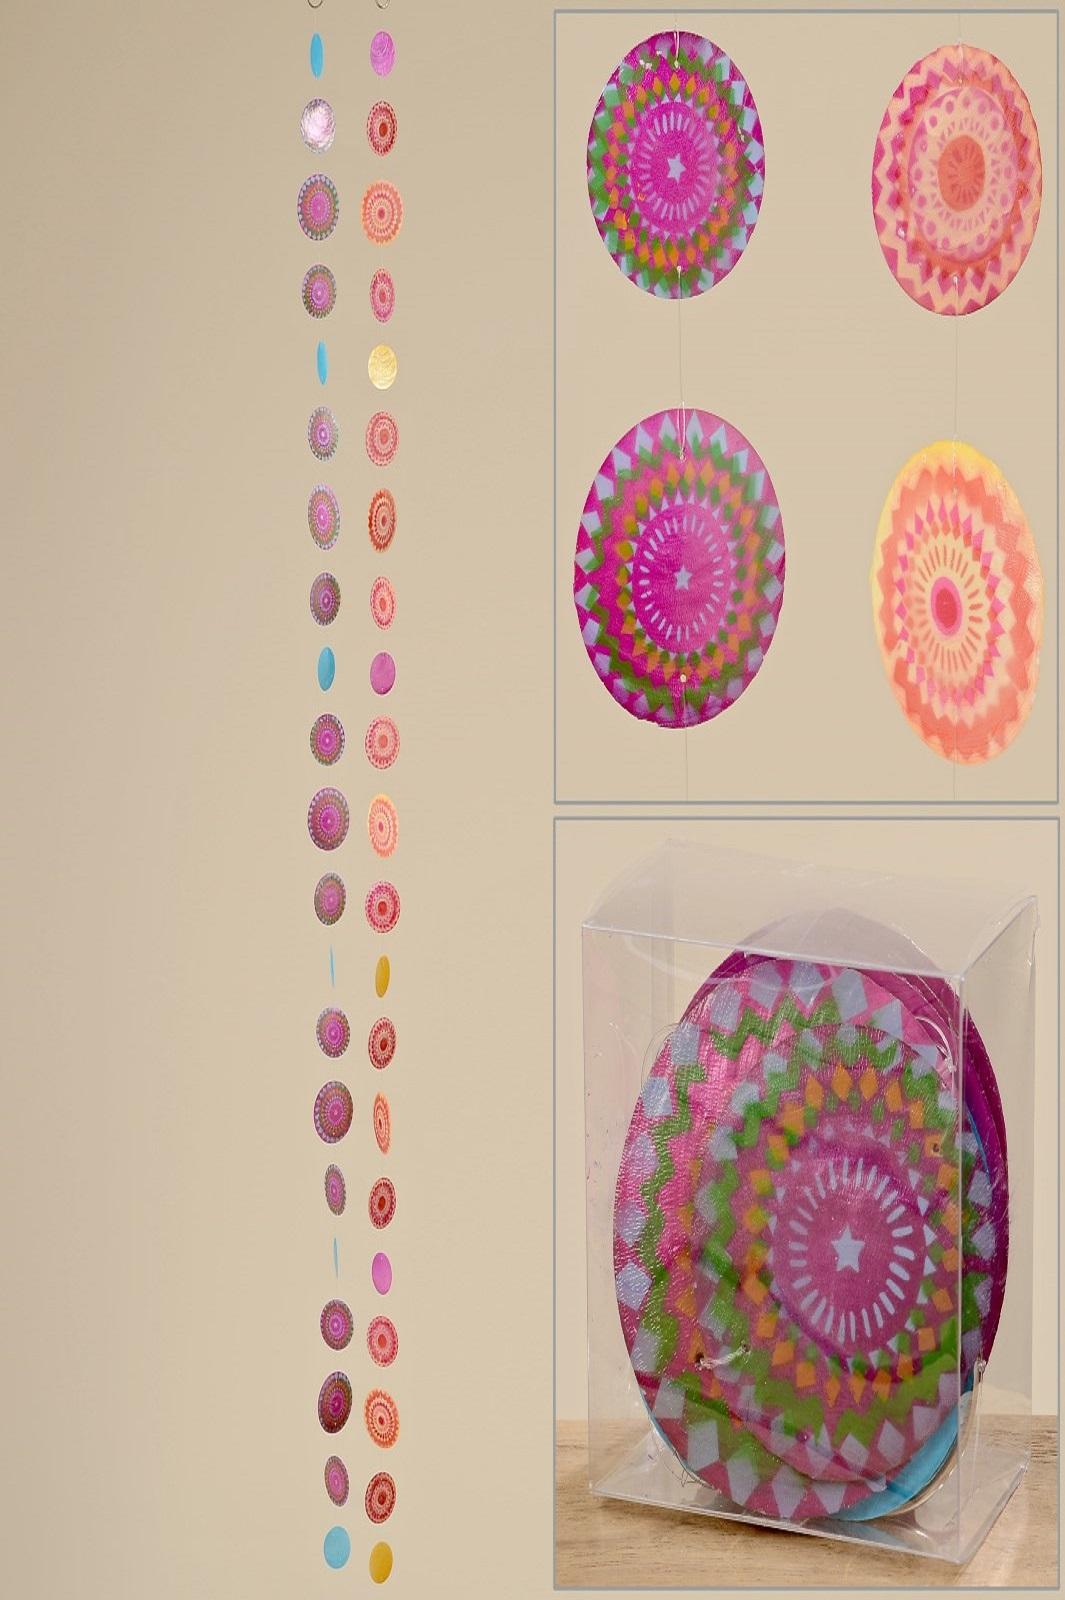 Muschelgirlande Capiz Girlande Sterne Blüten orange grün pink 1,80 m 2er Set